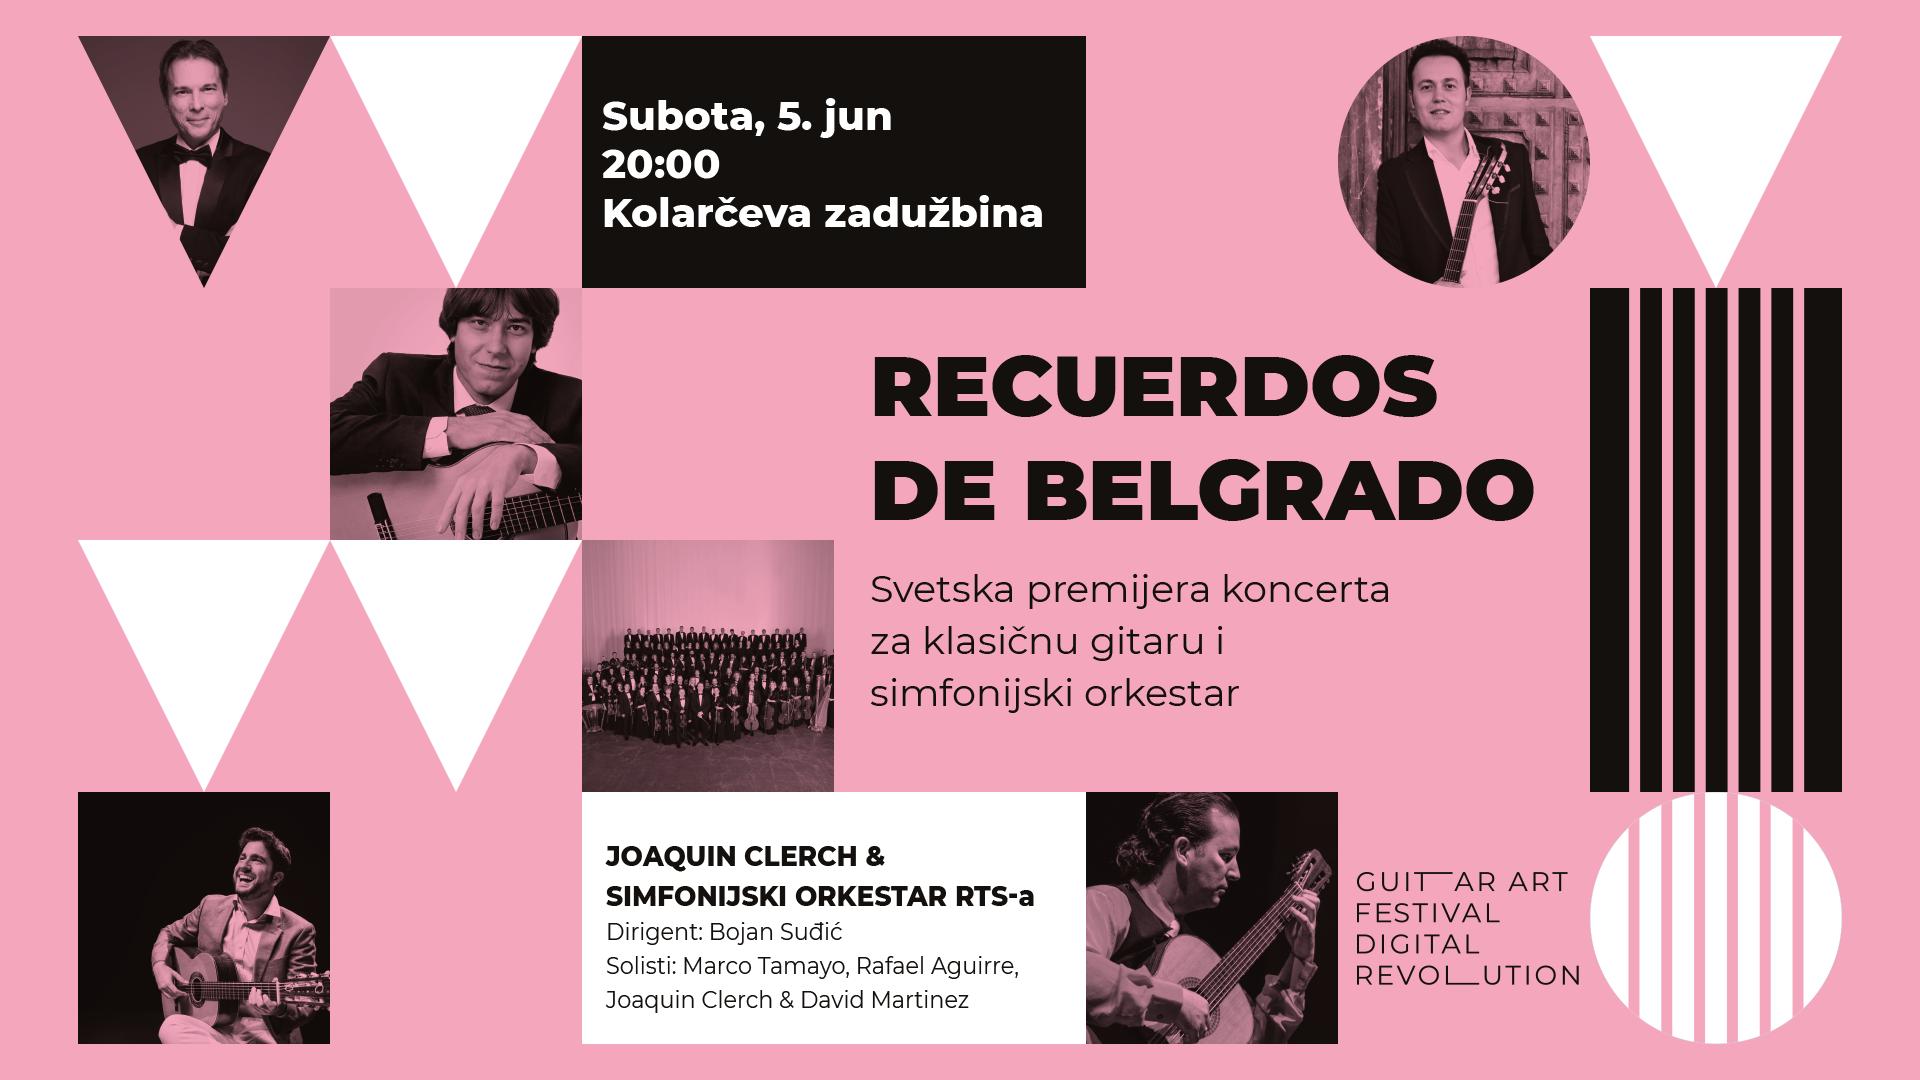 Guitar Art Festival - Recuerdos de Belgrado